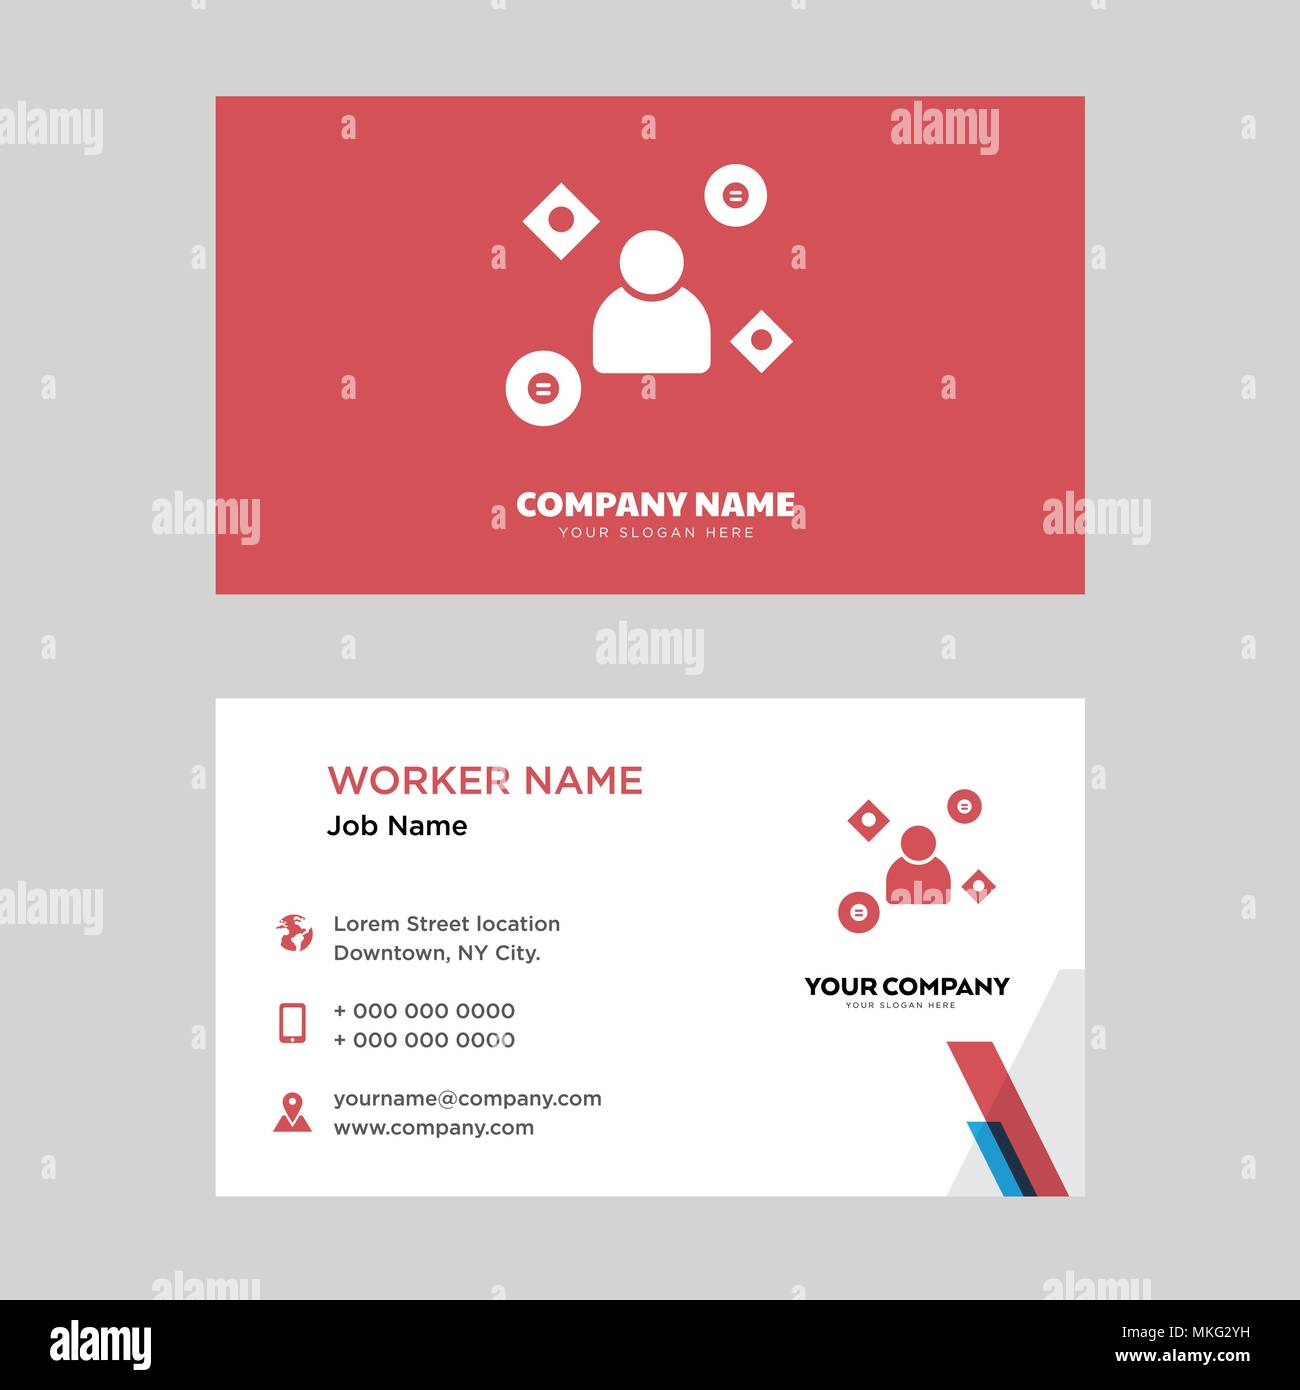 Business Card Auto Mechanic Car Stock Vector Images - Alamy